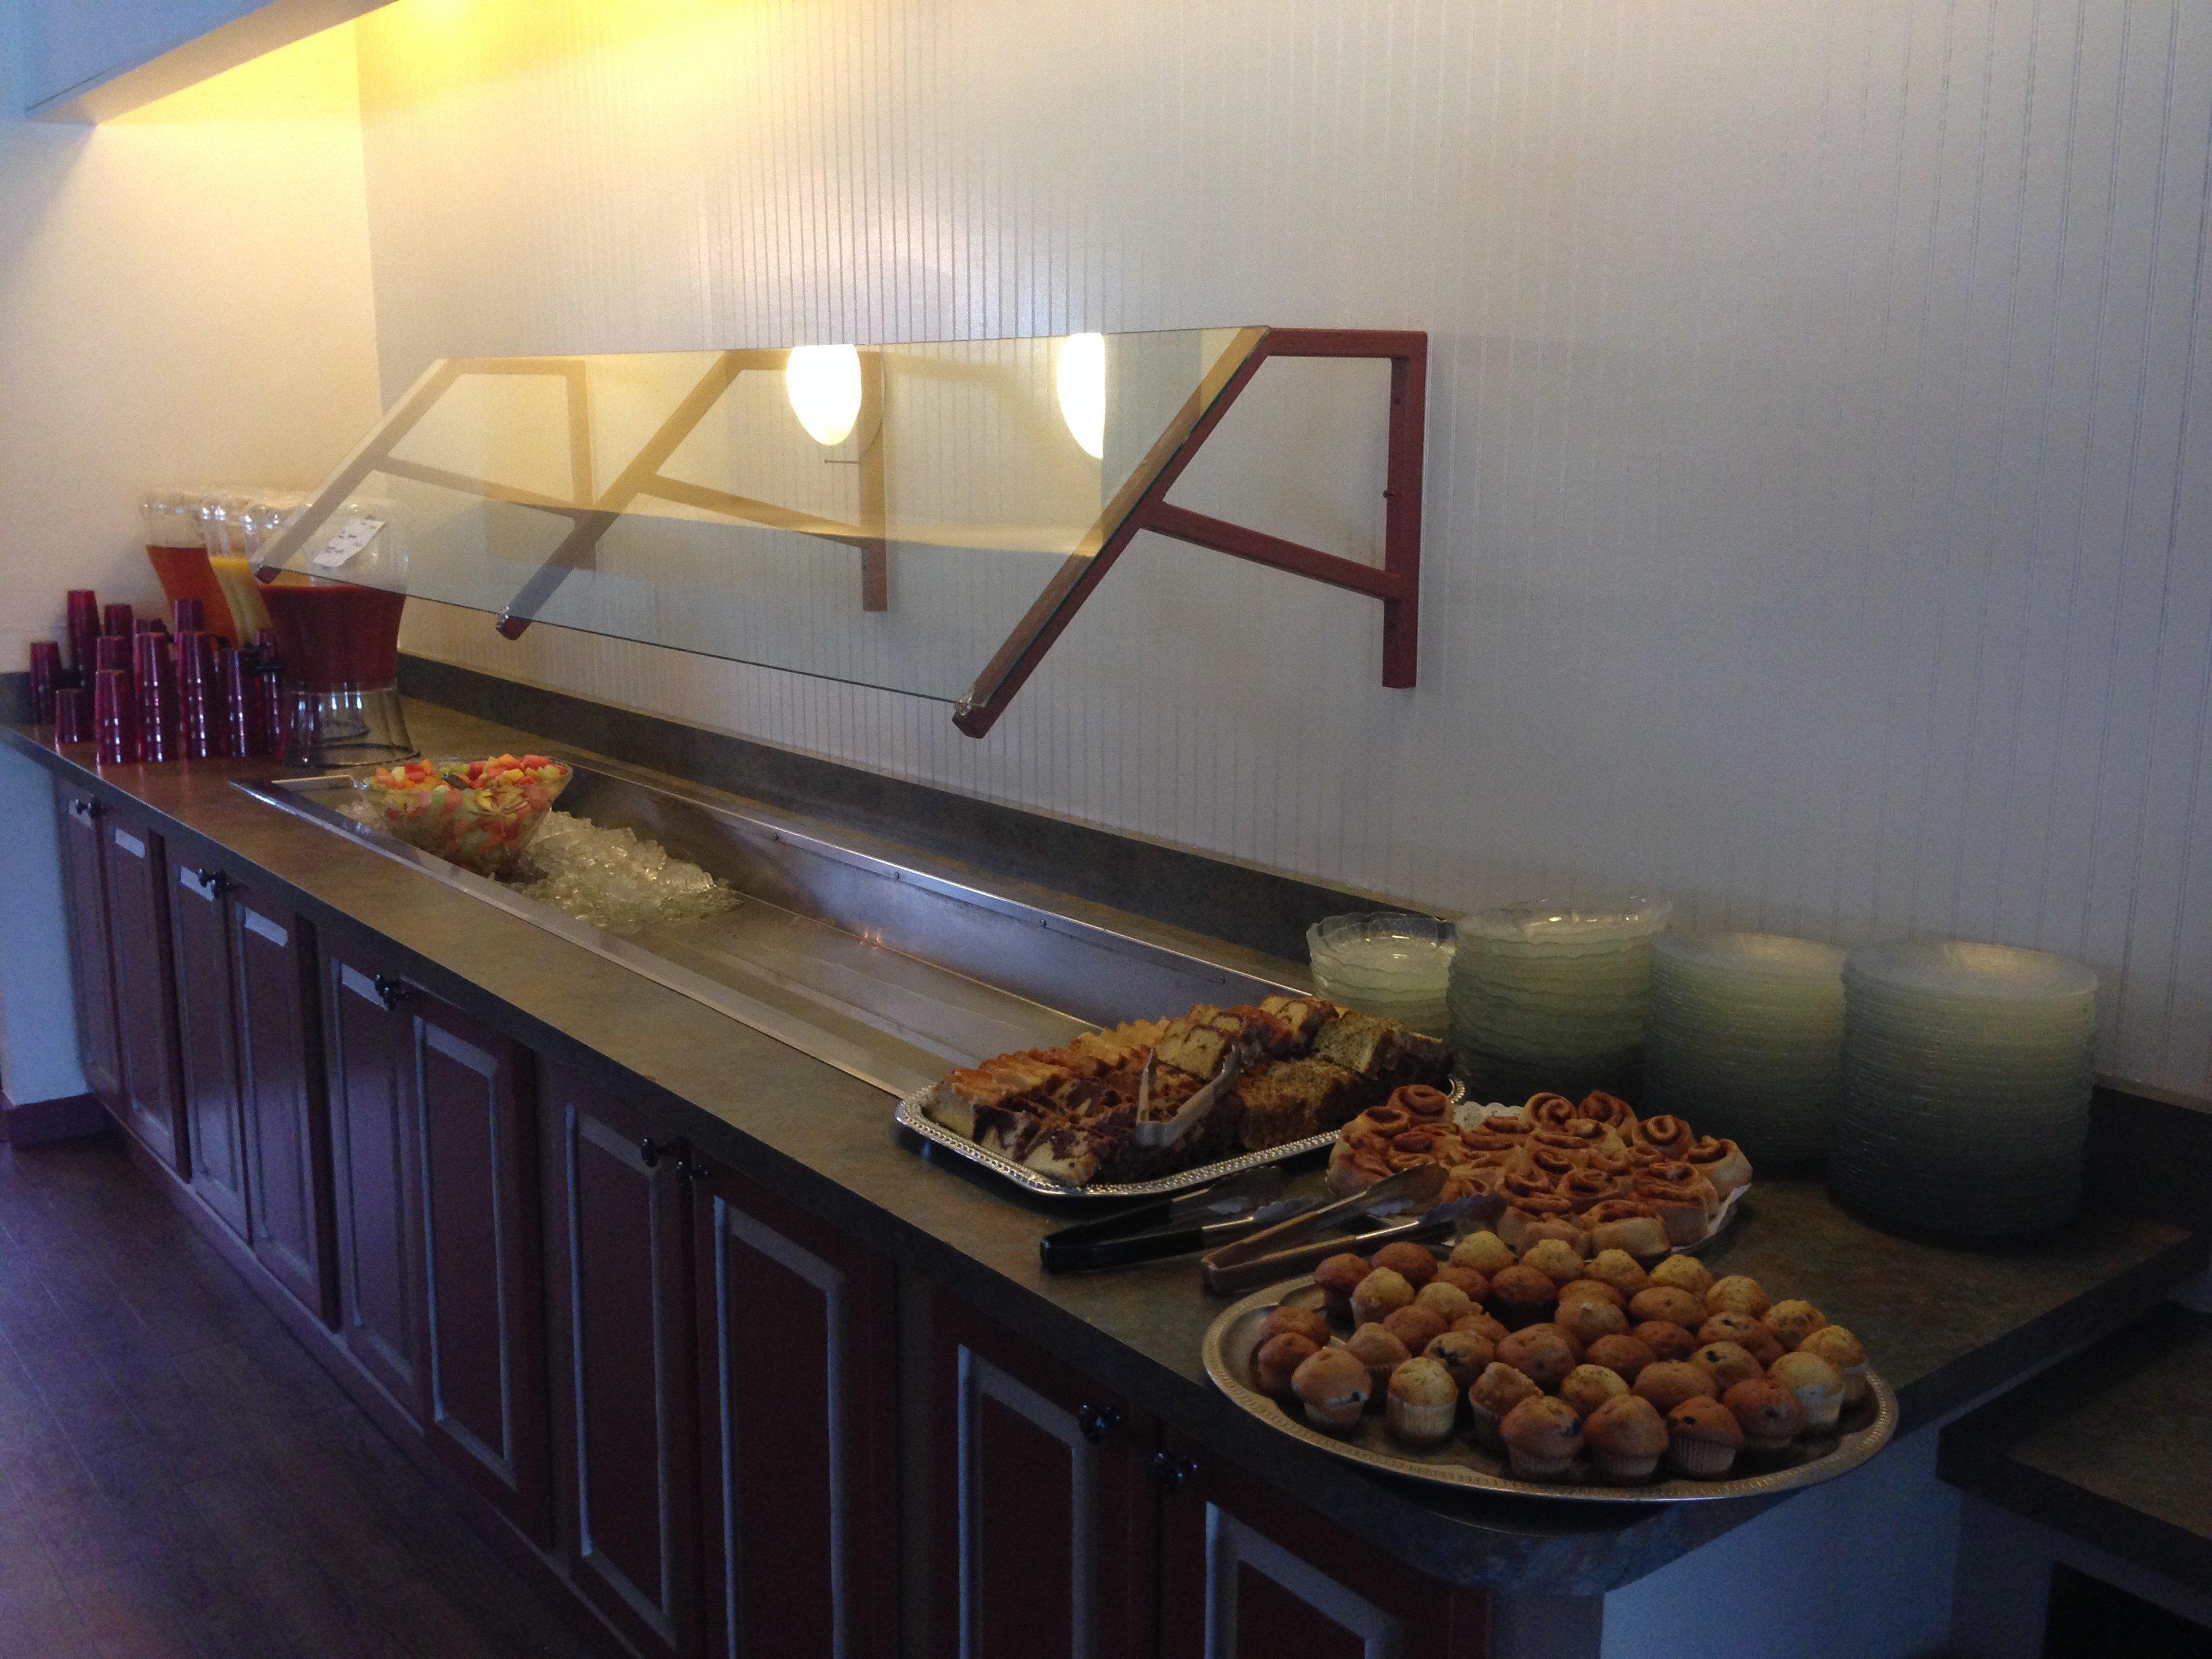 Charlmont Restaurant Sunday brunch buffet